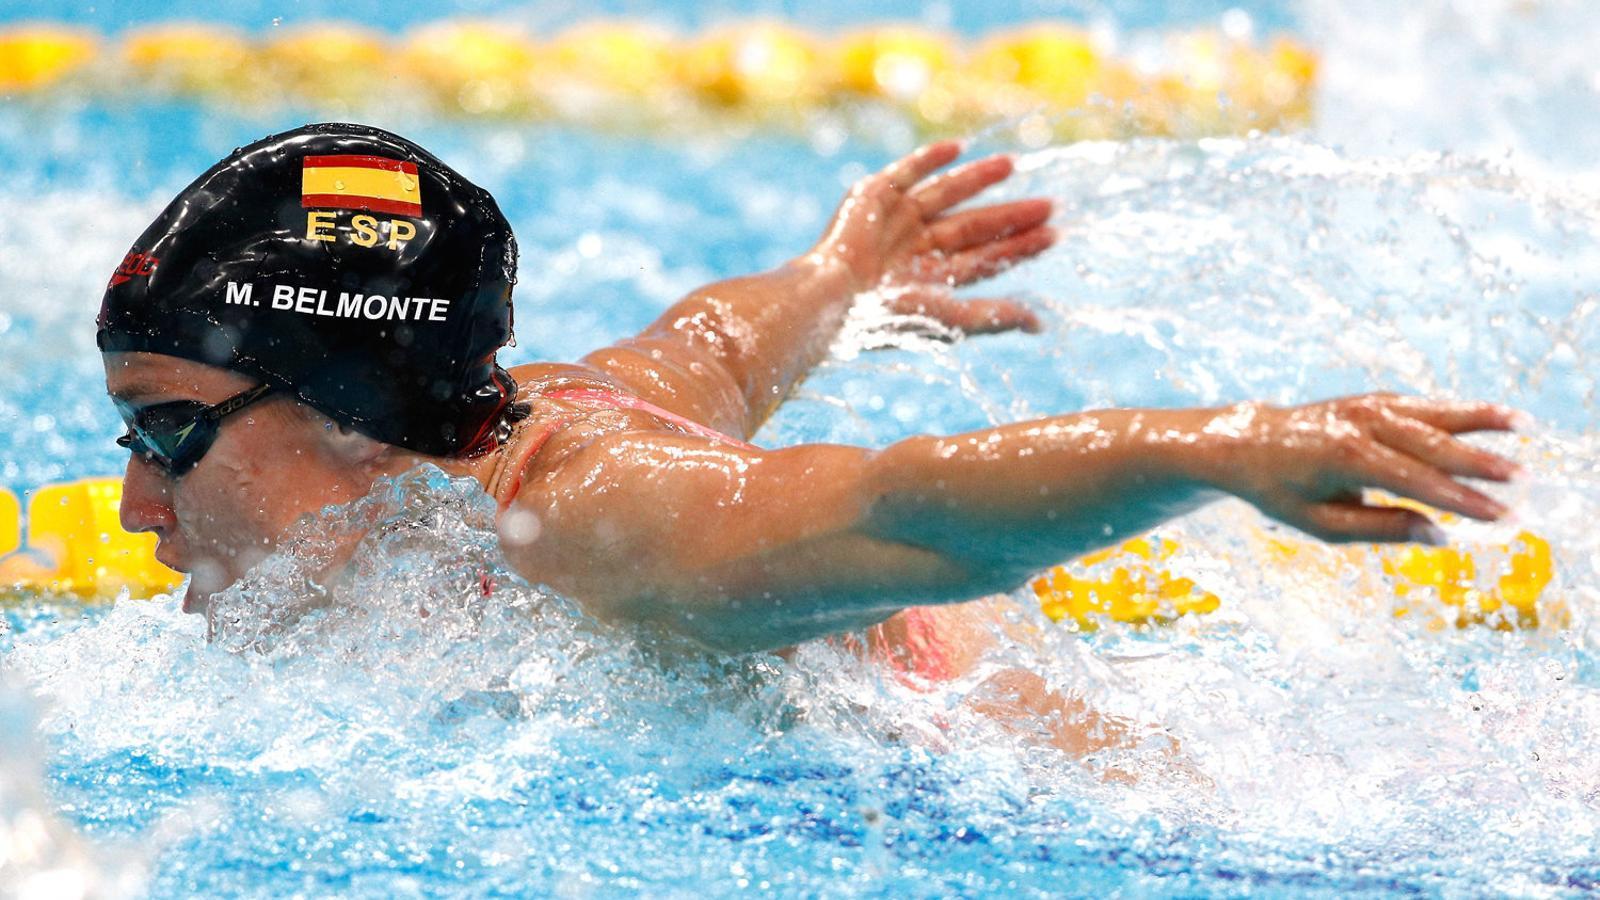 Belmonte, plata en 400 estils, ja suma sis medalles mundials